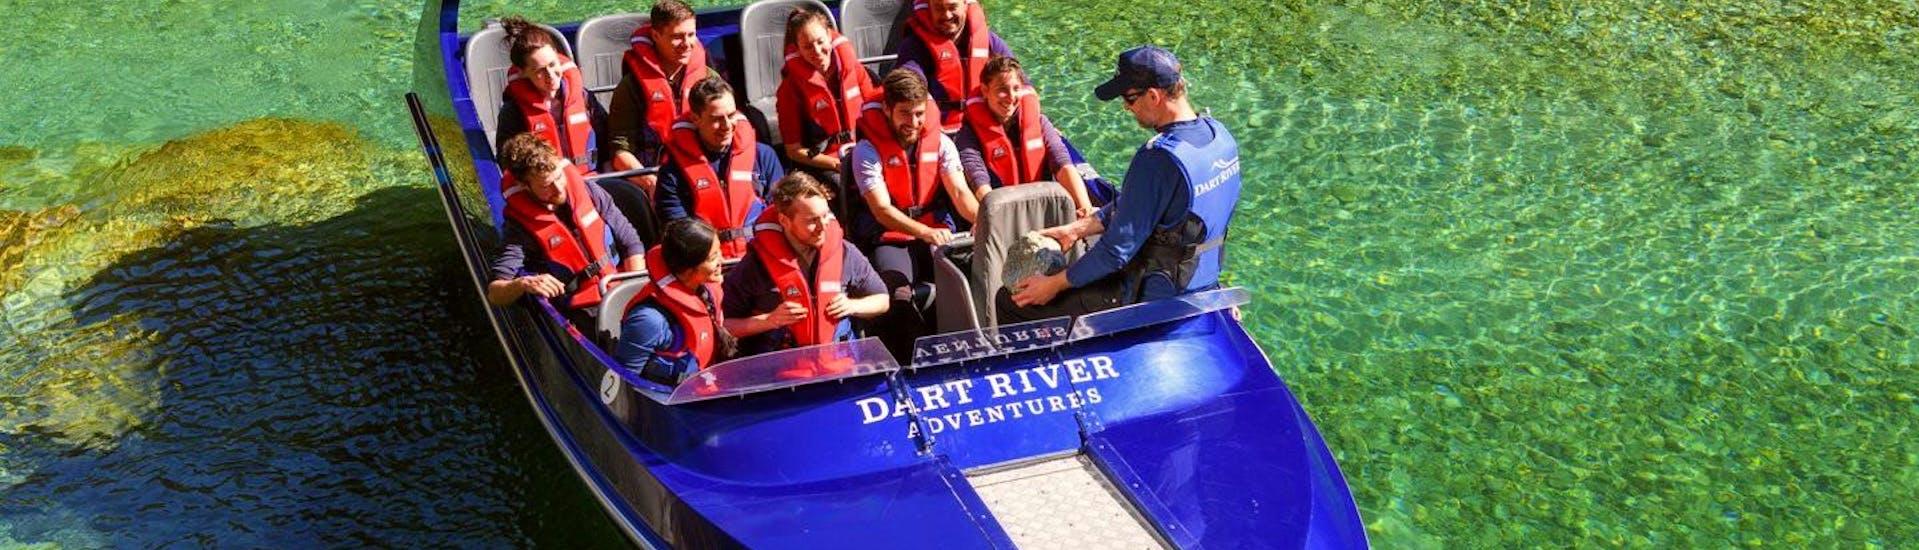 jet-boat-tour-in-glenorchy-with-transfer-from-queenstown-dart-river-adventures-queenstown-hero